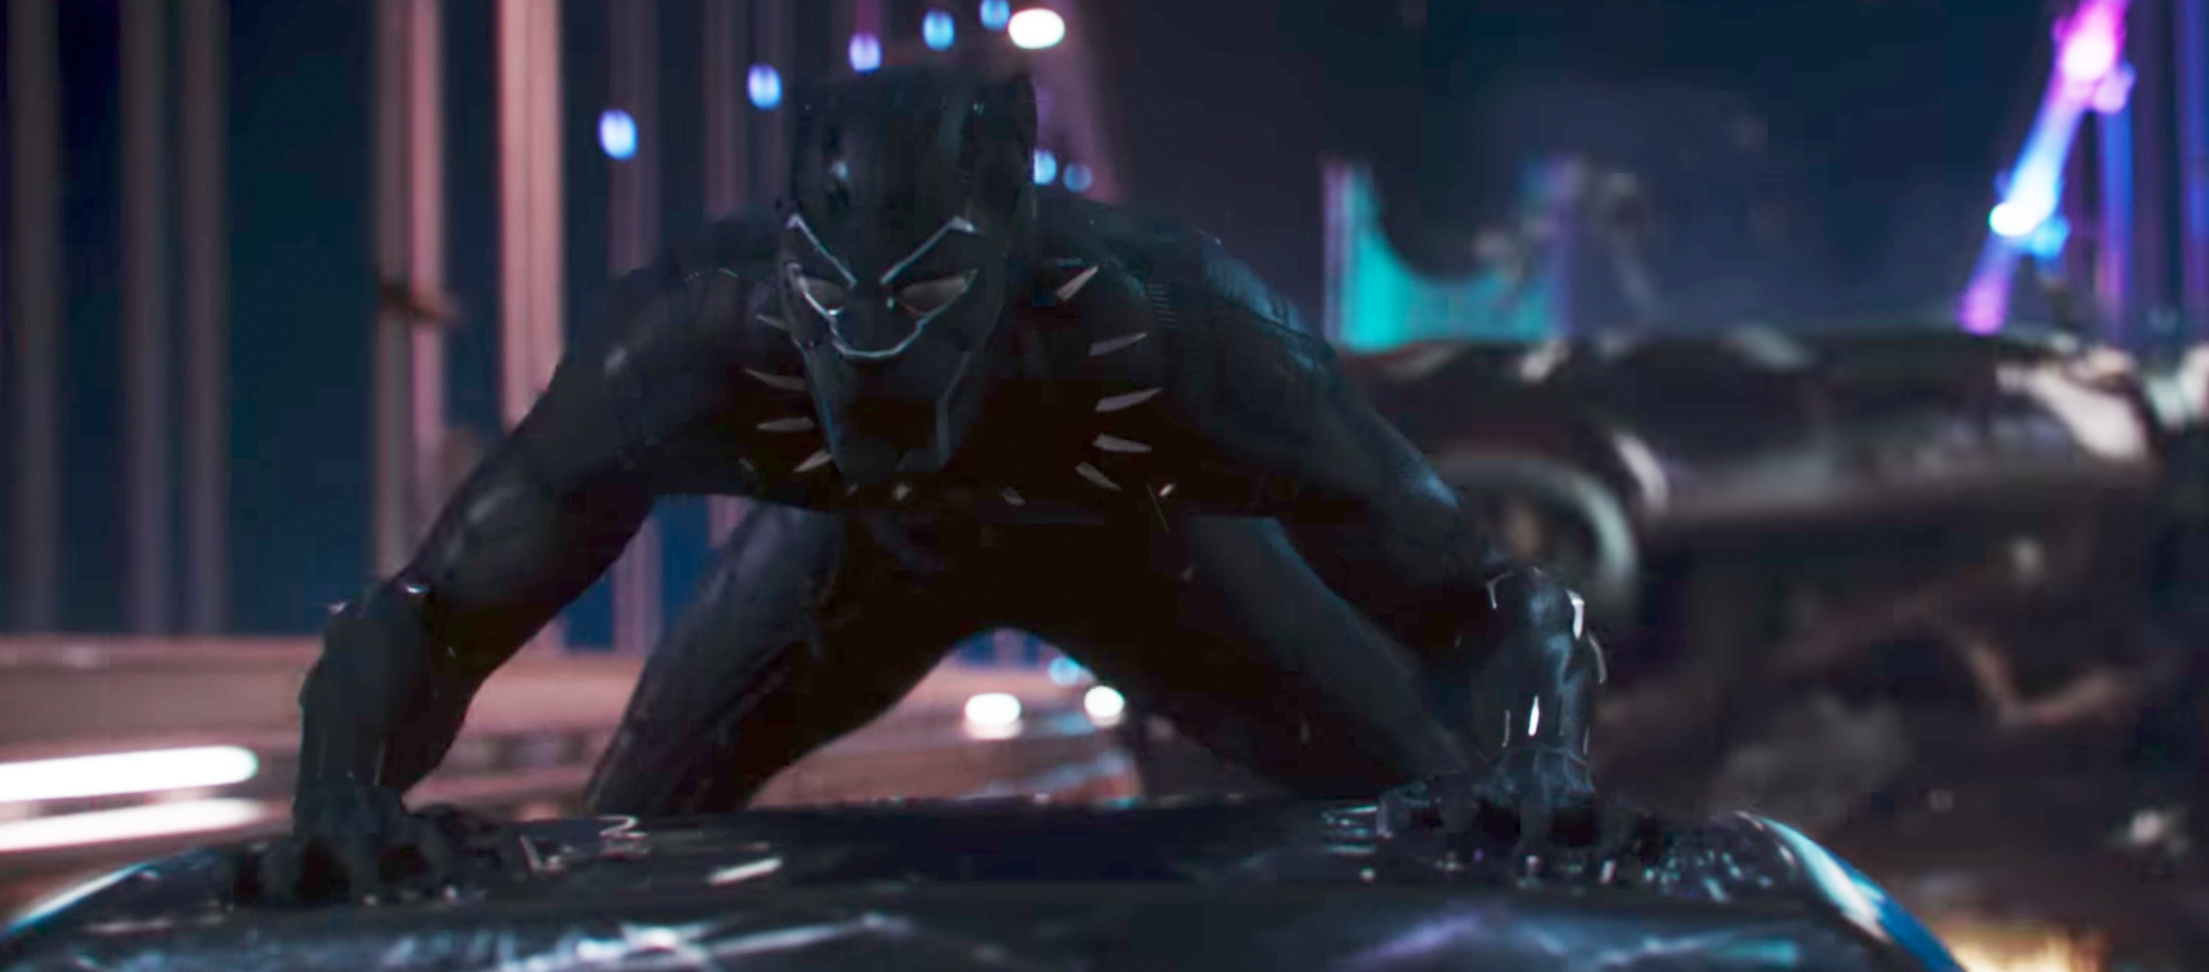 alternate versions of black panther